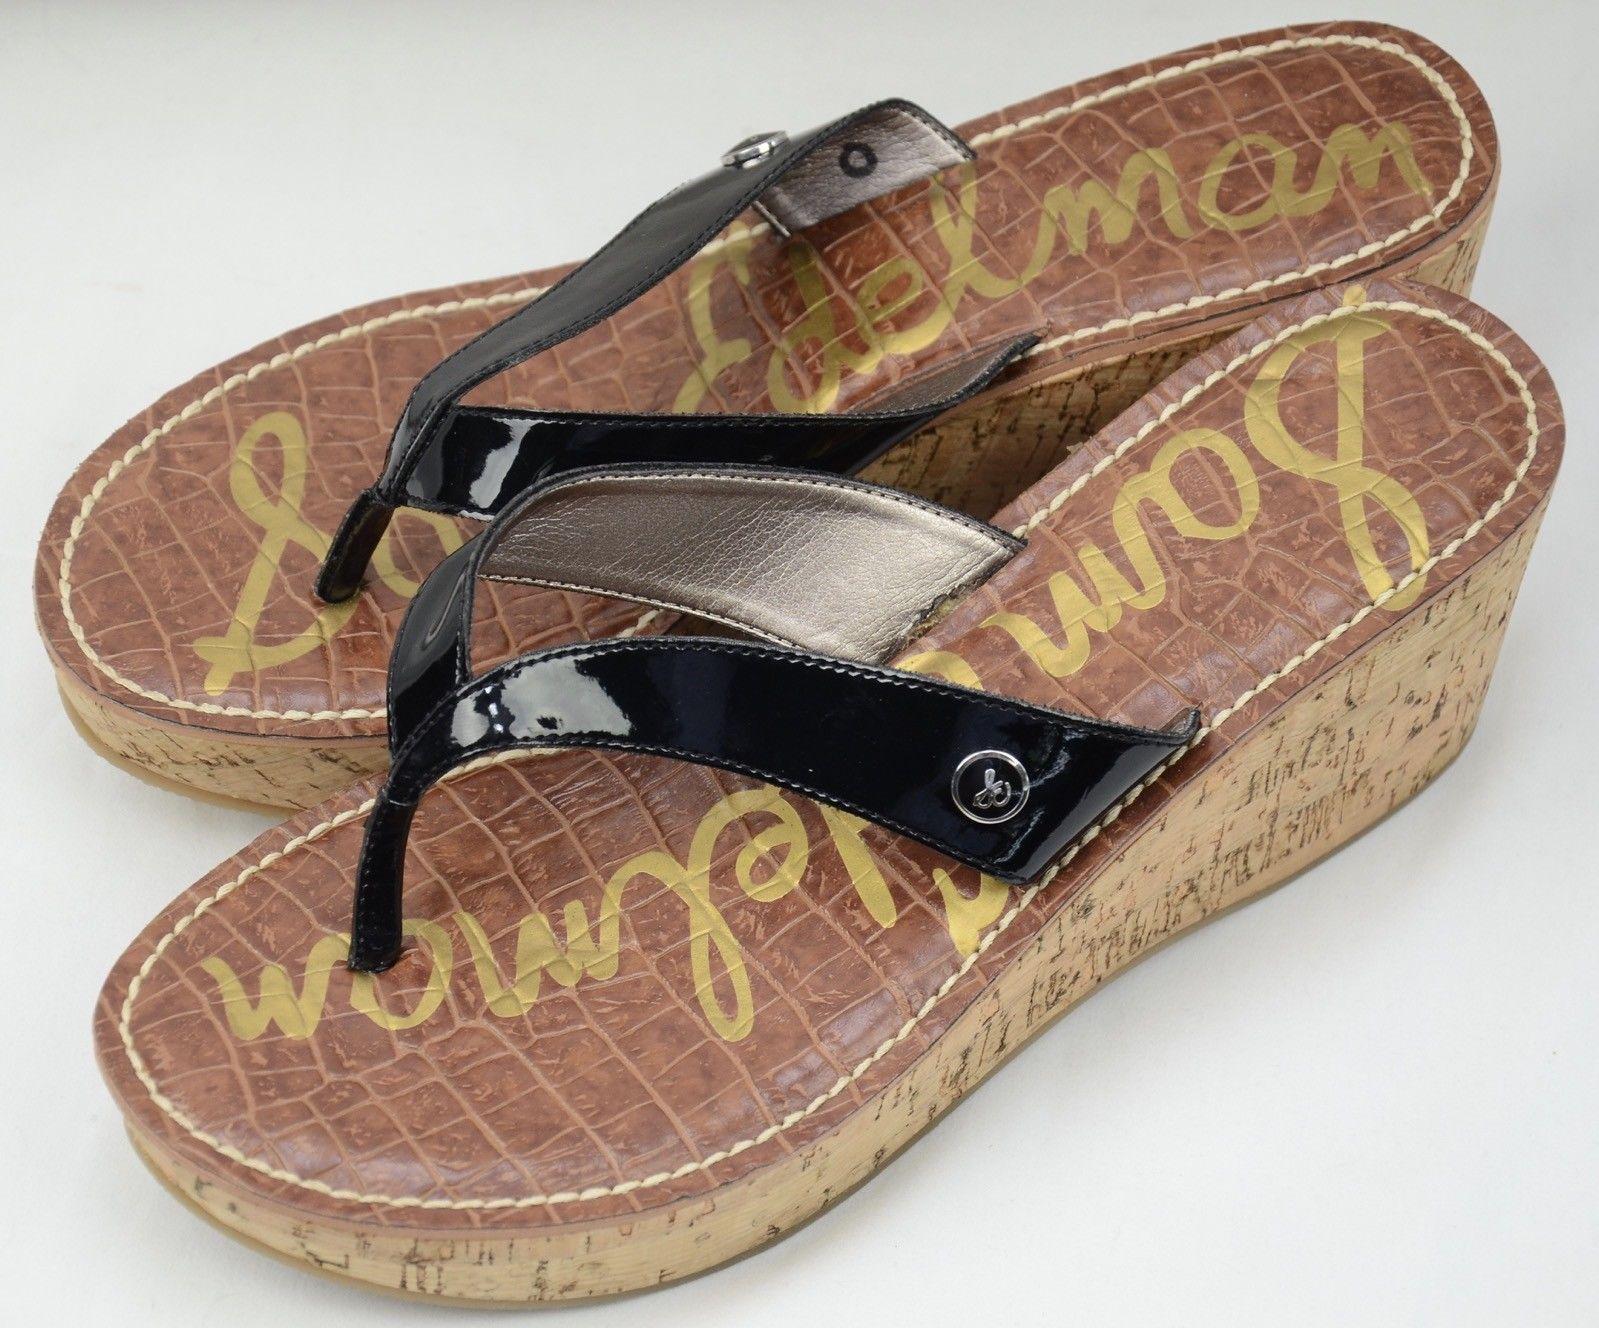 e930b87d7 New Sam Edelman Romy Black Flip Flop Wedge Sandals sz 8.5 NWOT ...